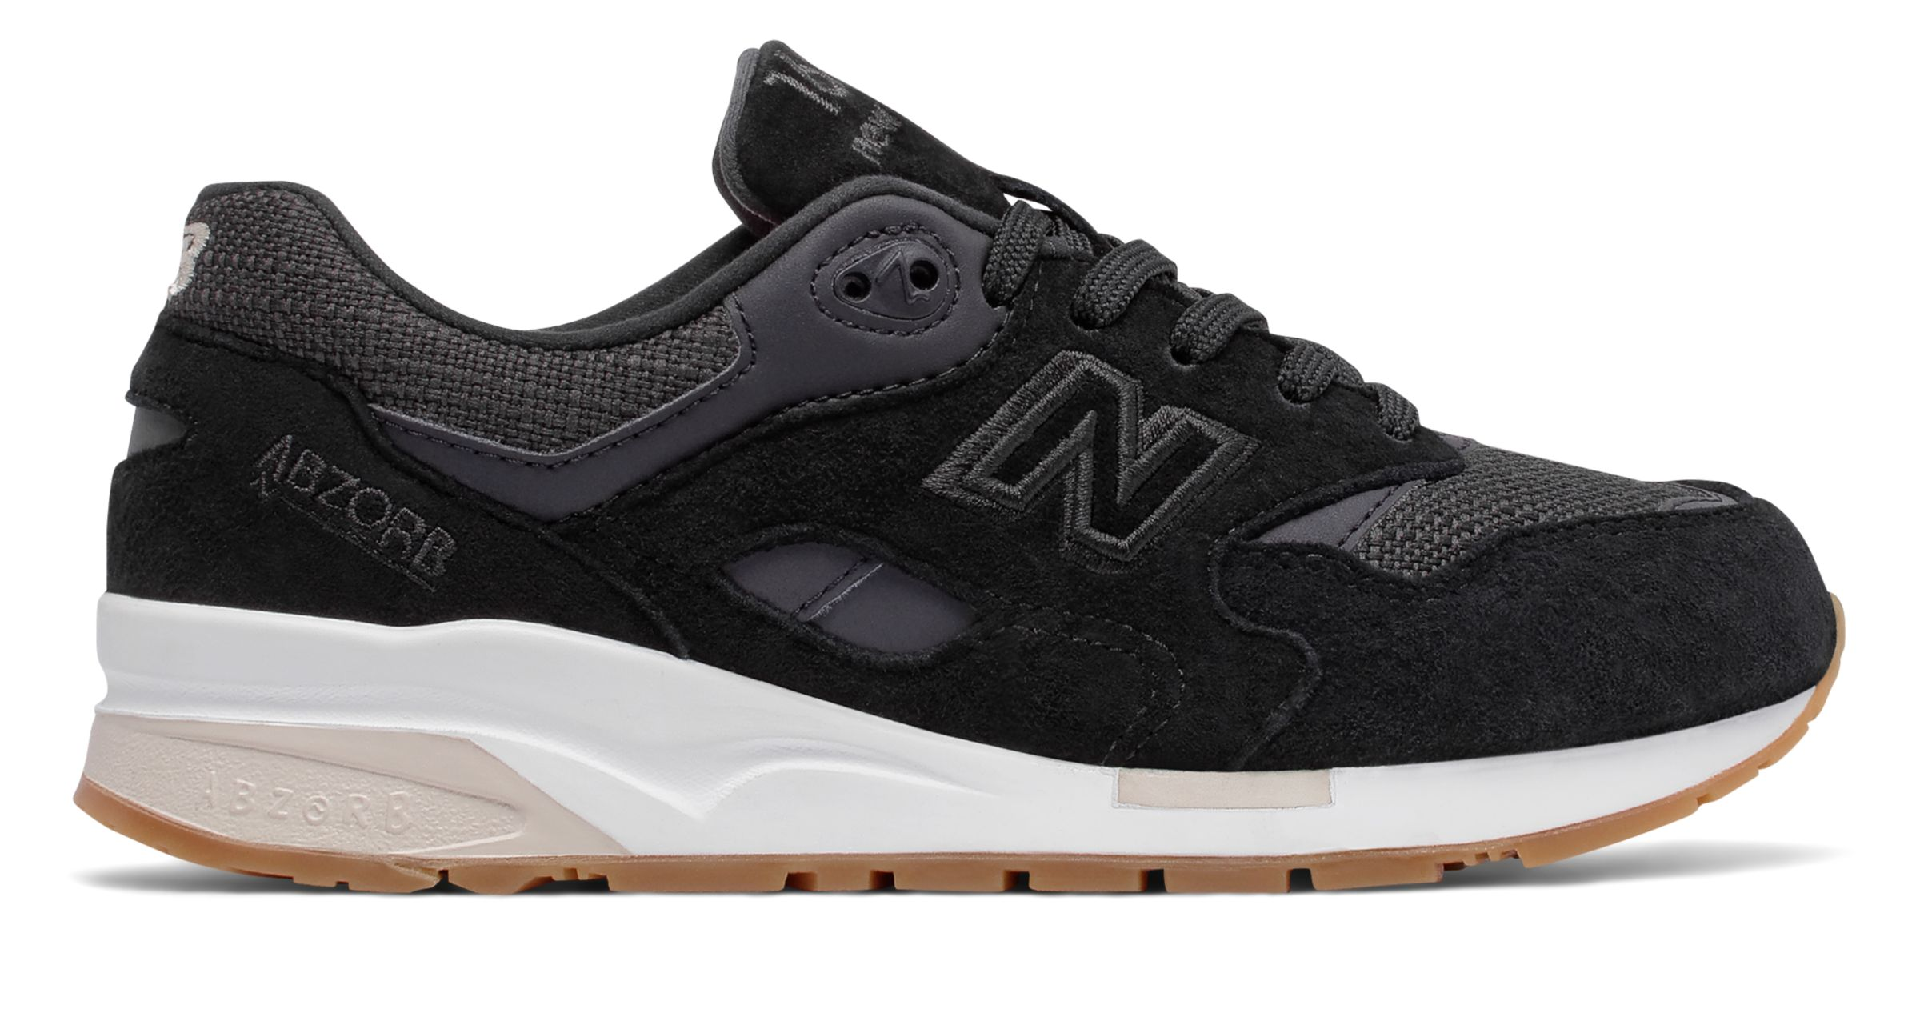 c495b9a11c1 New Balance 1600 Women's Lifestyle Shoes - CW1600CB